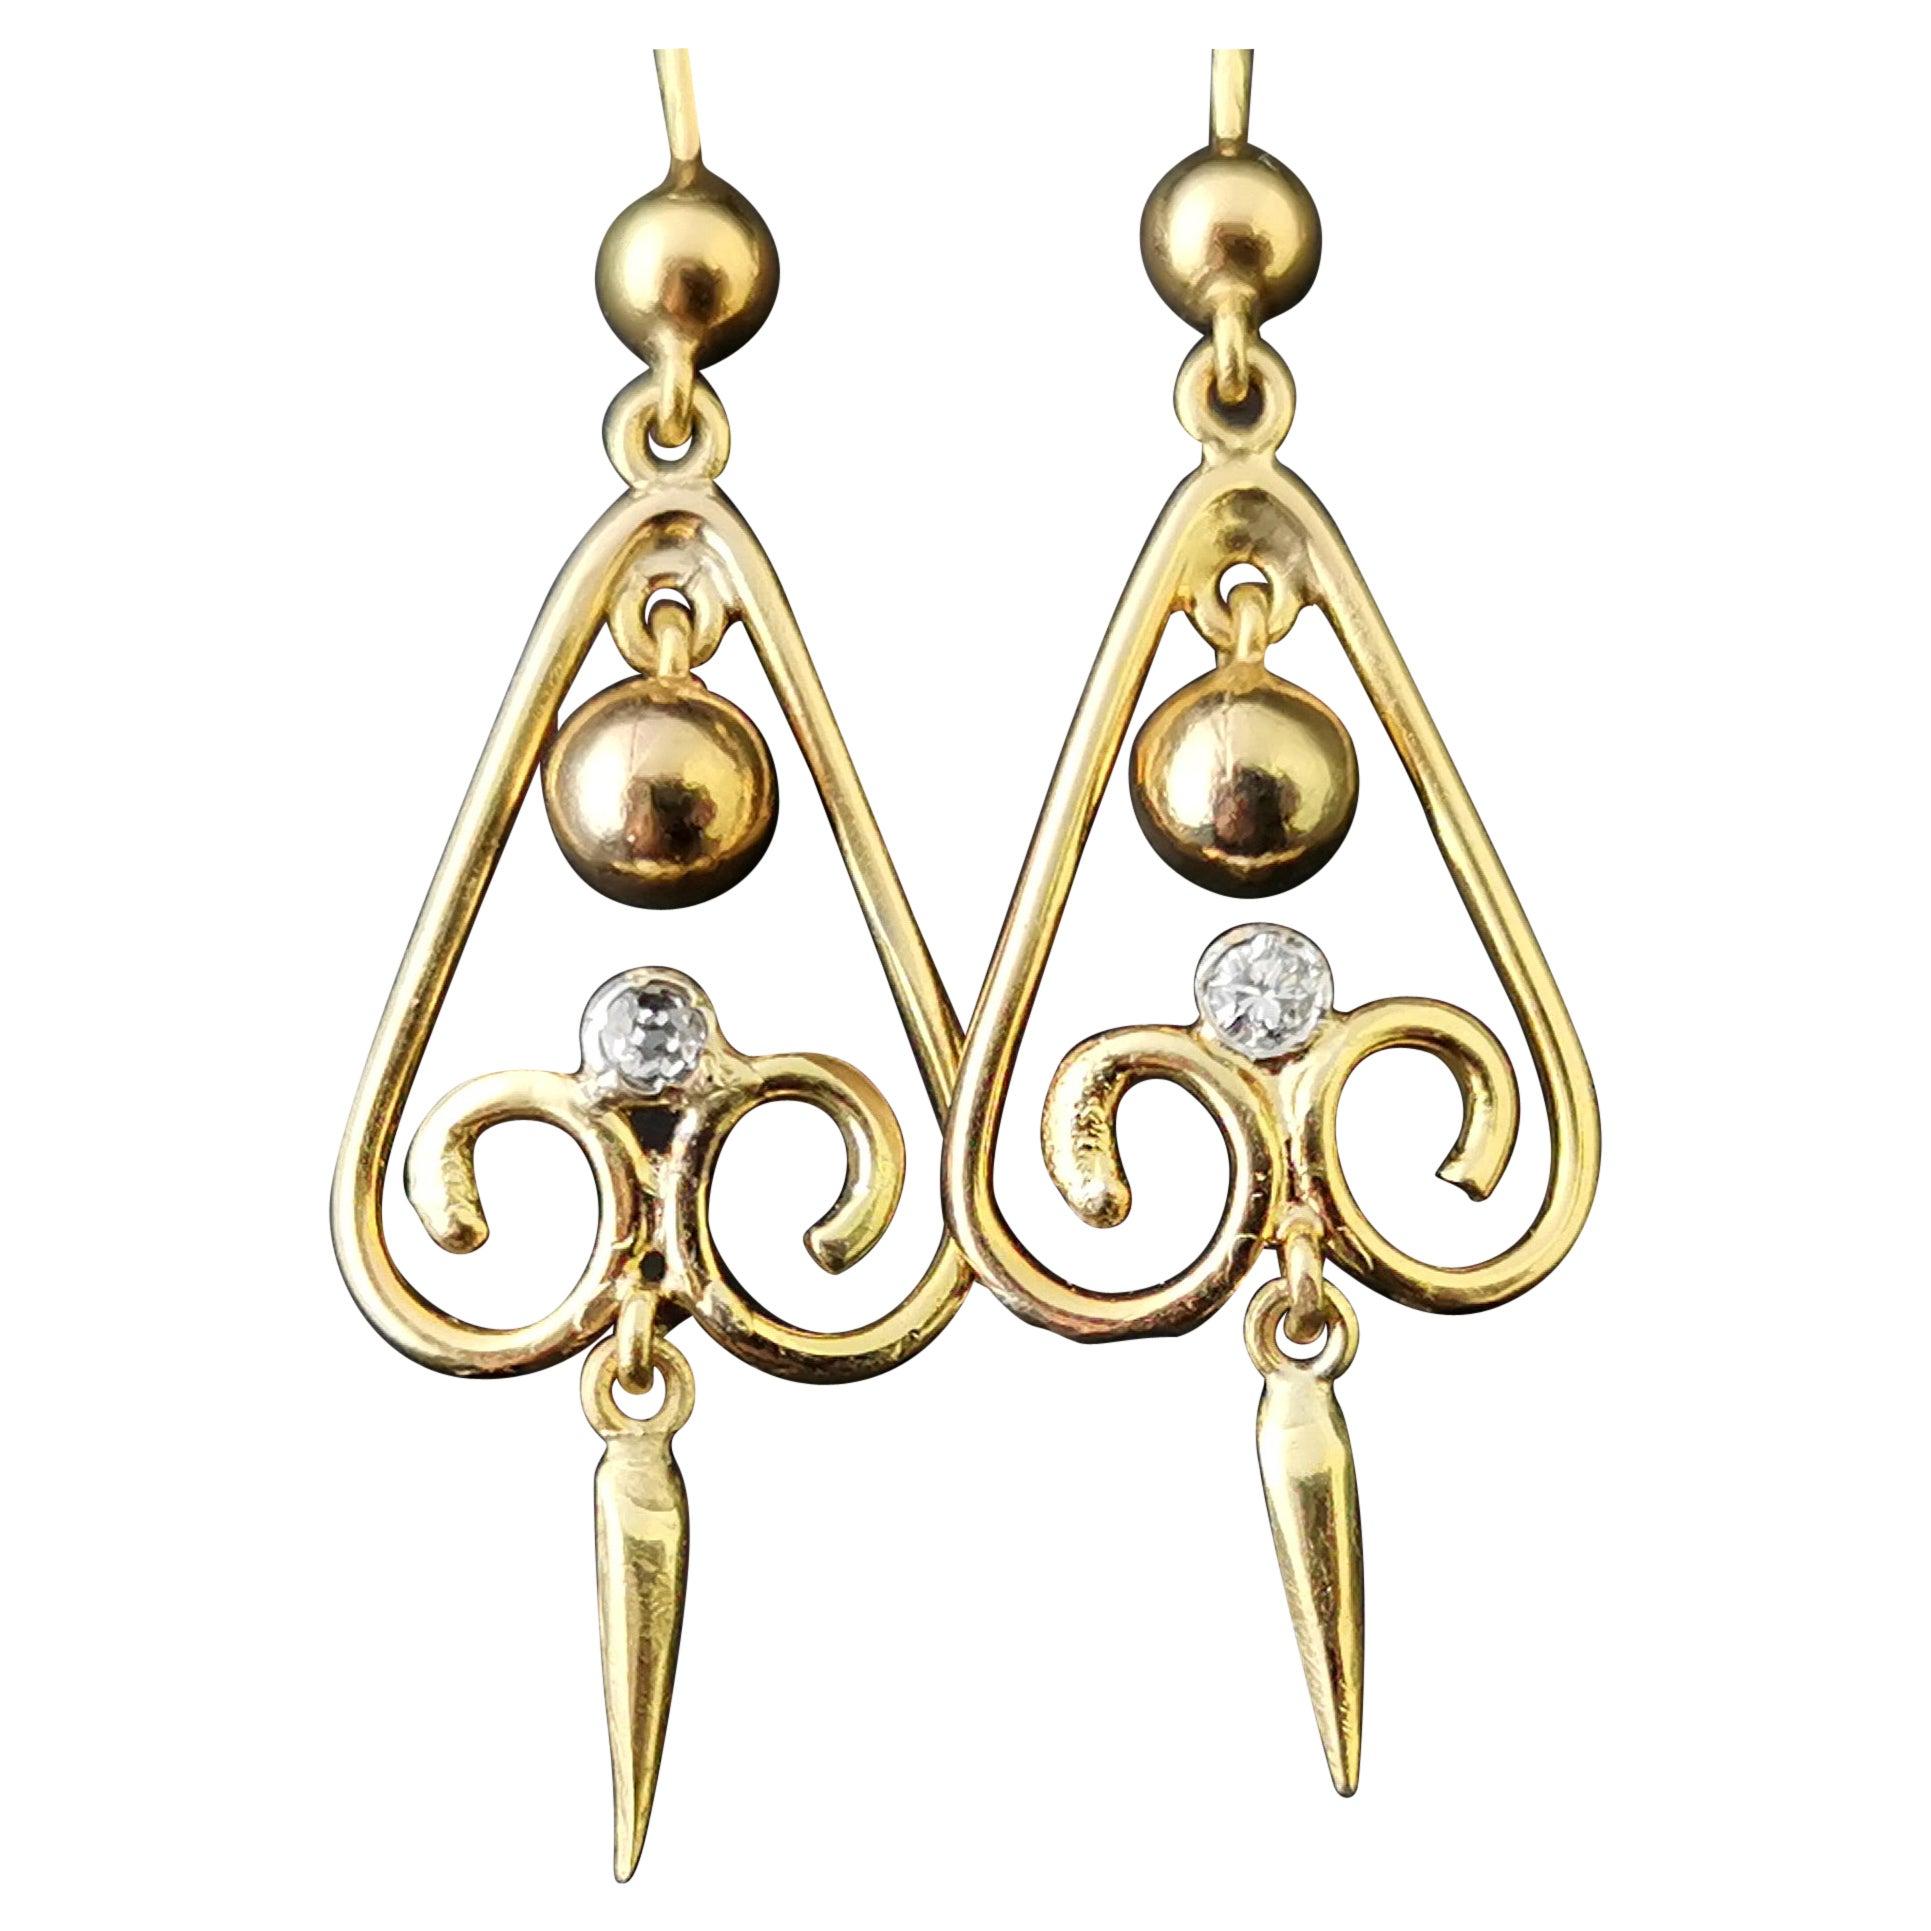 Antique Victorian Diamond Drop Earrings, 15ct Yellow Gold, Dangly Earrings